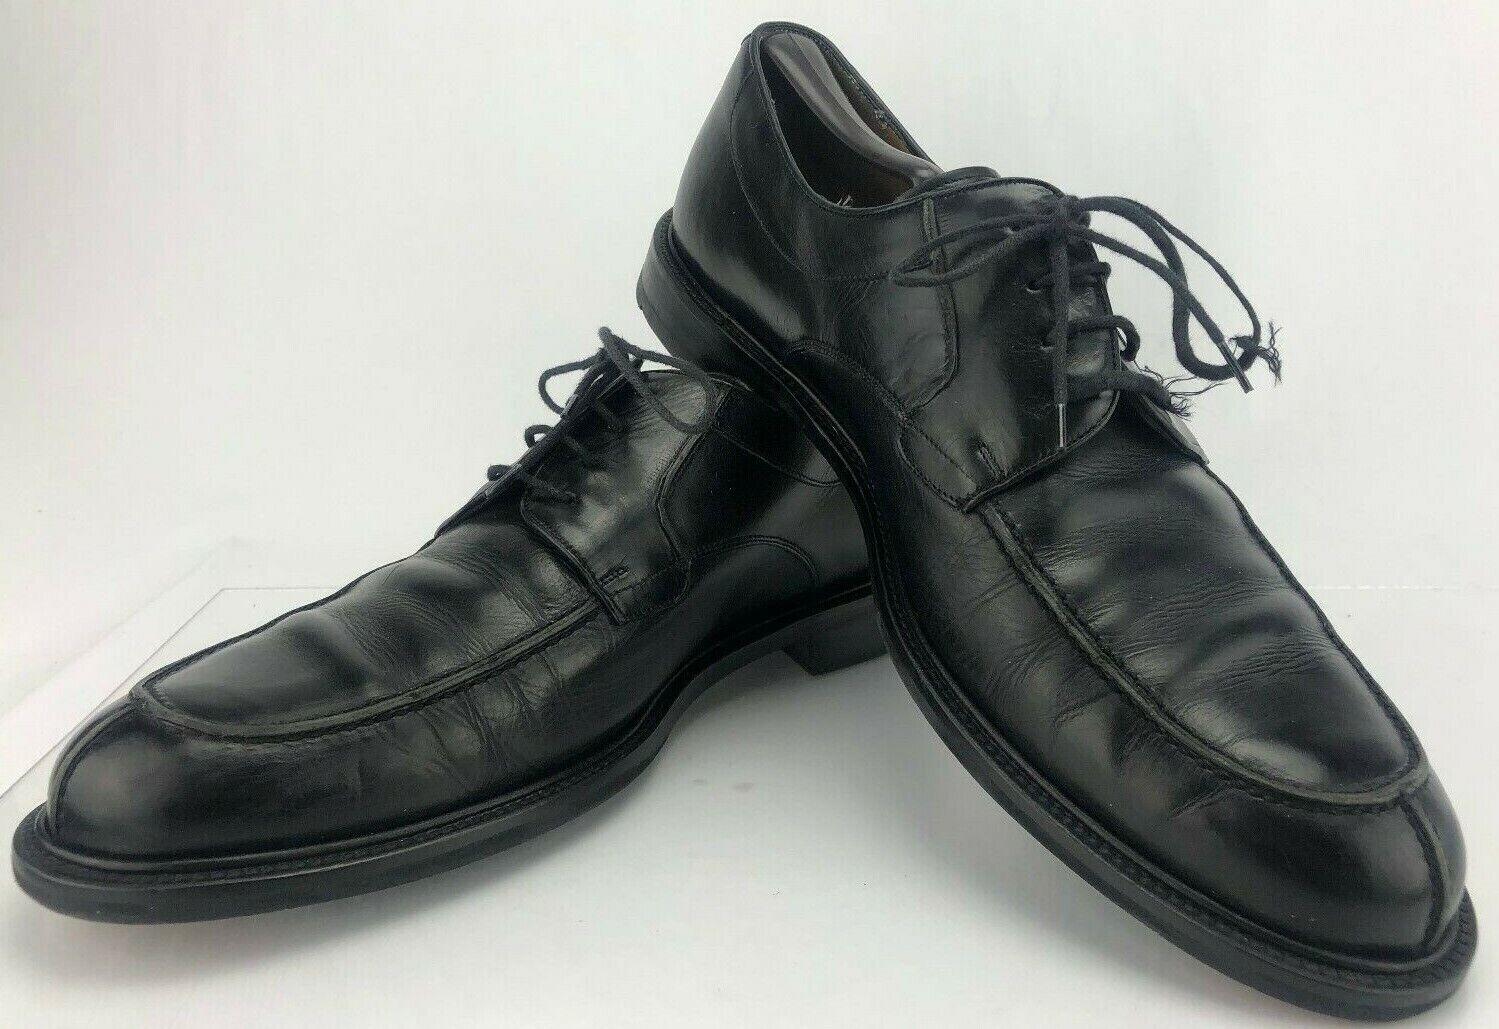 buona reputazione Mezlan Dress Dress Dress scarpe Split Apron Toe nero Lace Up Leather Oxford Derby Uomo 12 W  al prezzo più basso